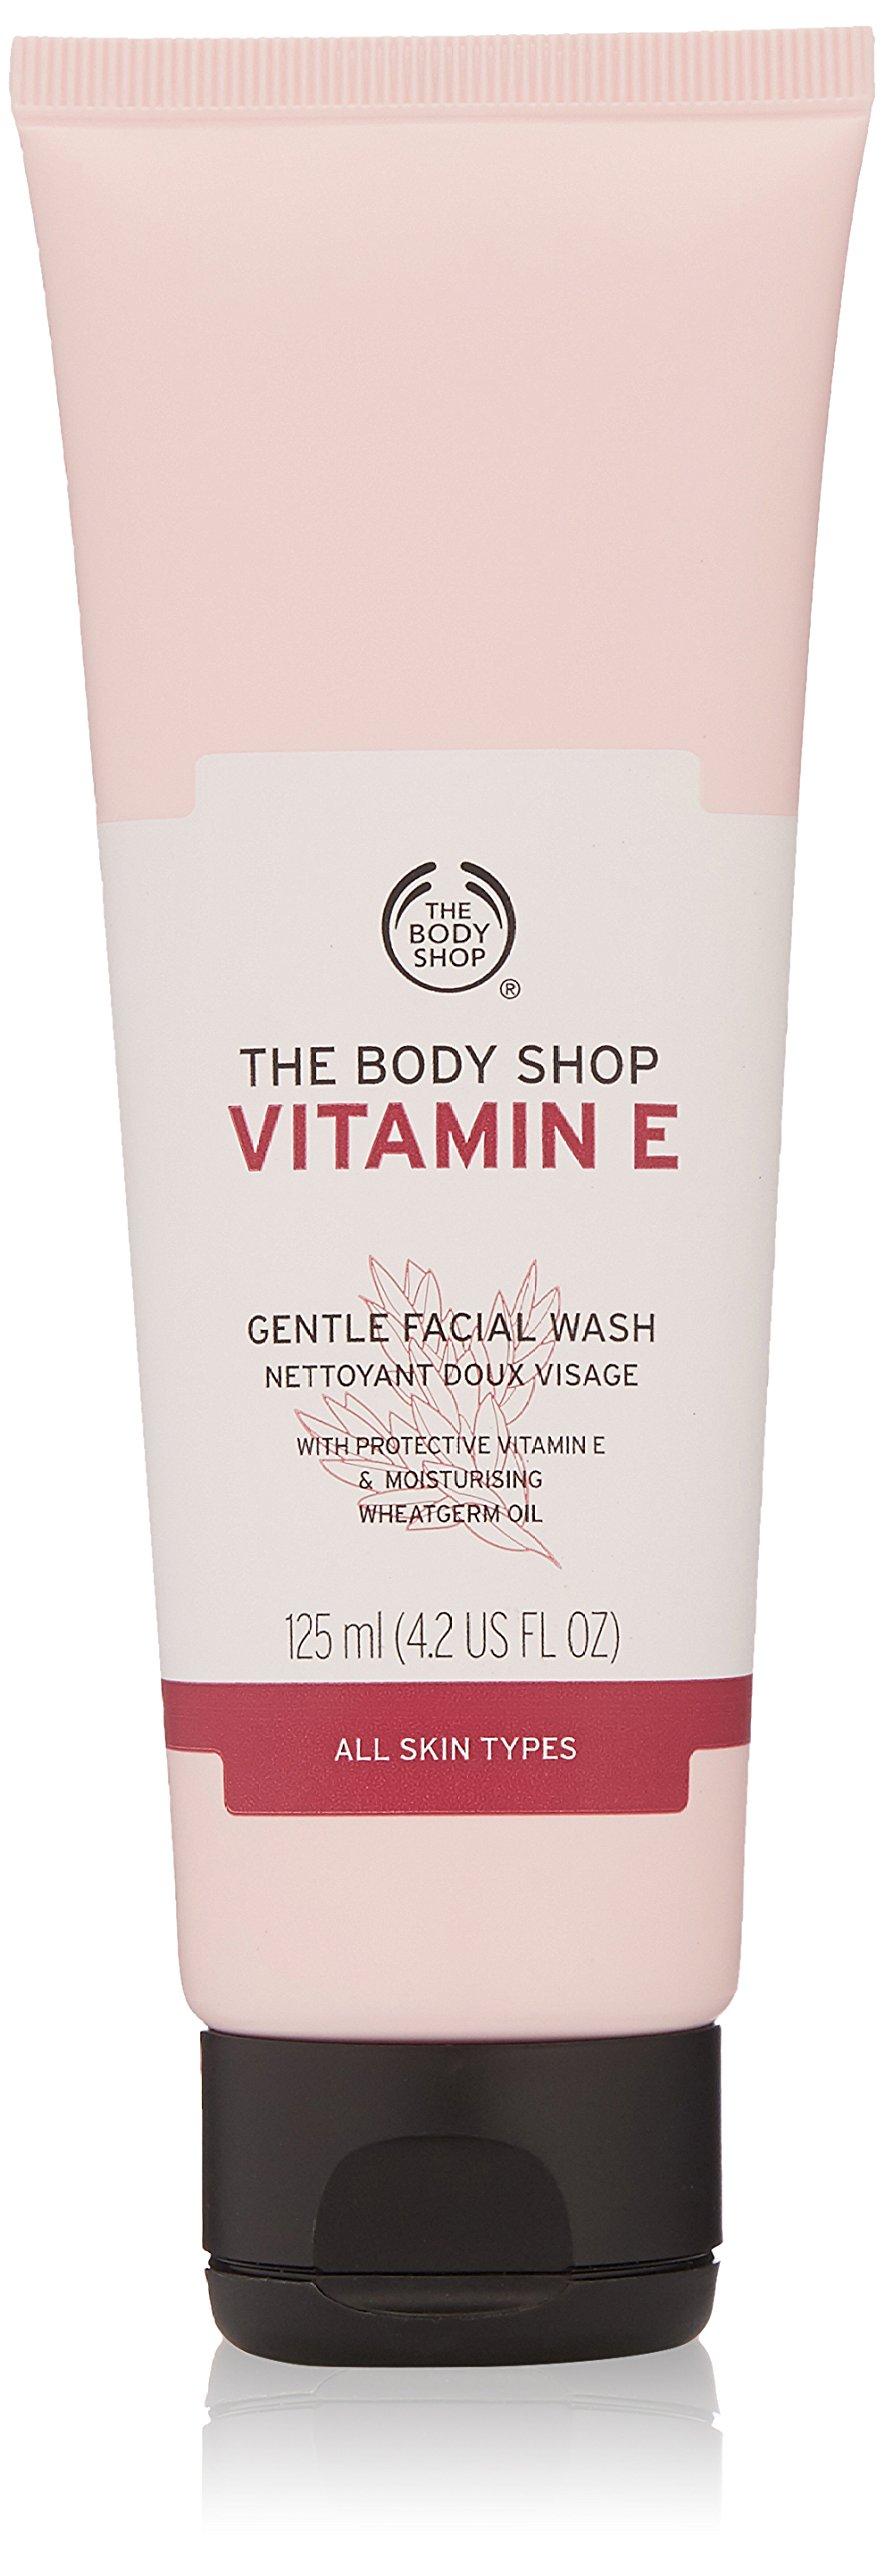 best paraben free facial moisturizer